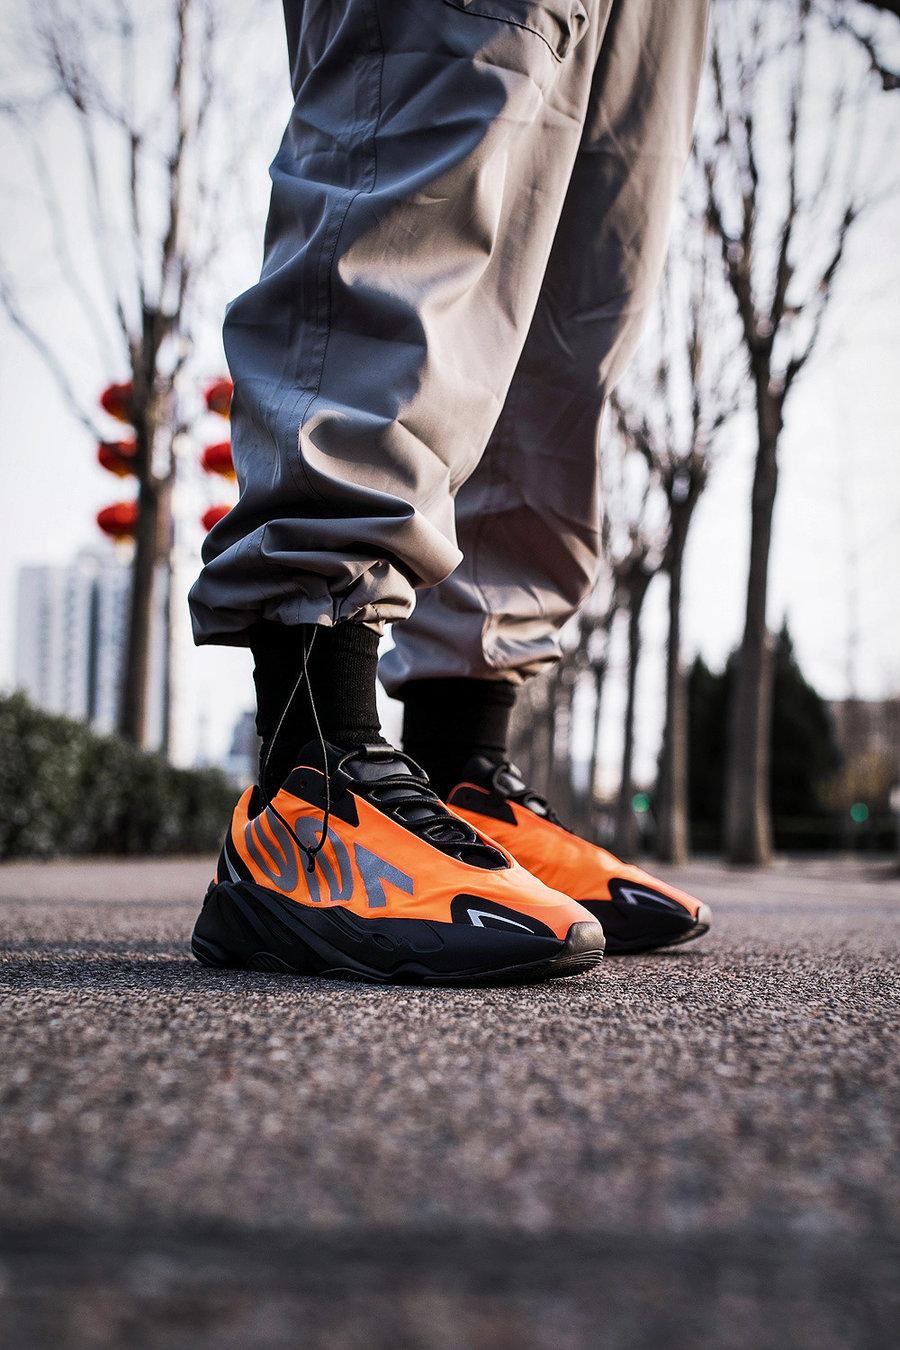 AJ1,Air Jordan 1,Yeezy 700  本周末 4 双限量球鞋新品,在这个特殊时期的行情如何?